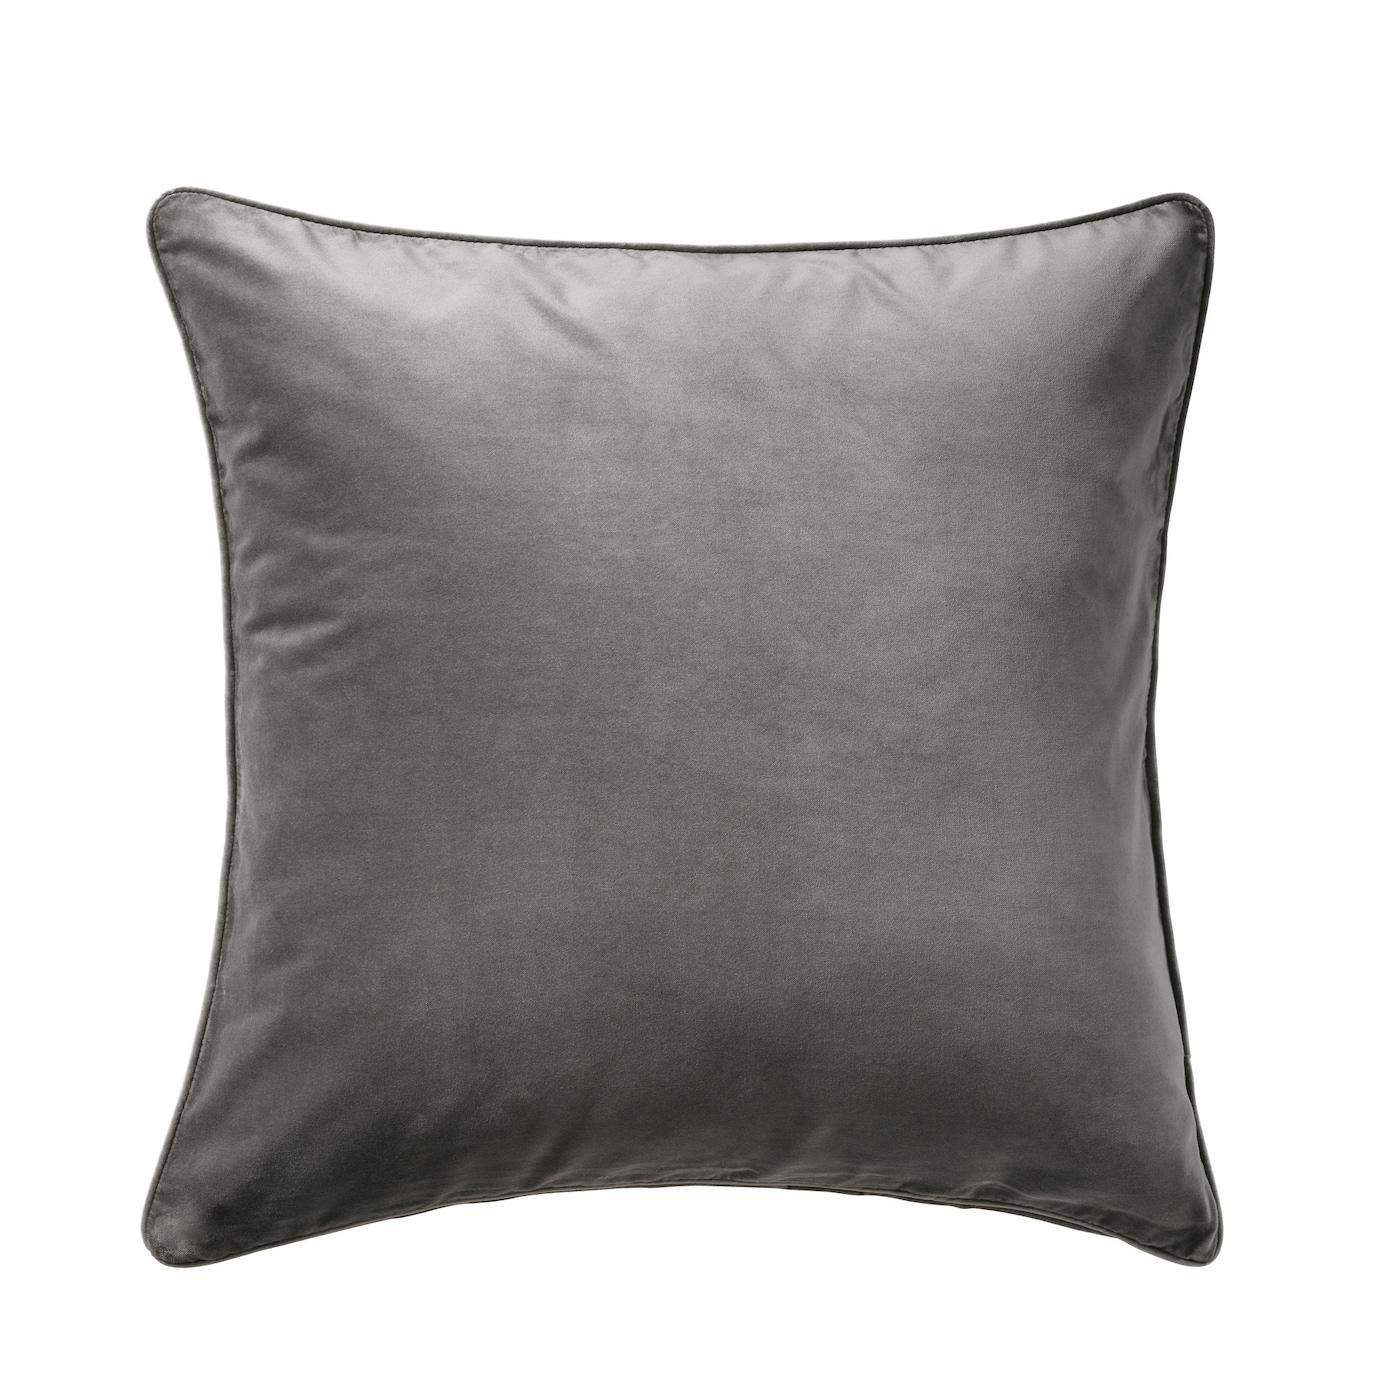 hoofdkussen ikea. Black Bedroom Furniture Sets. Home Design Ideas